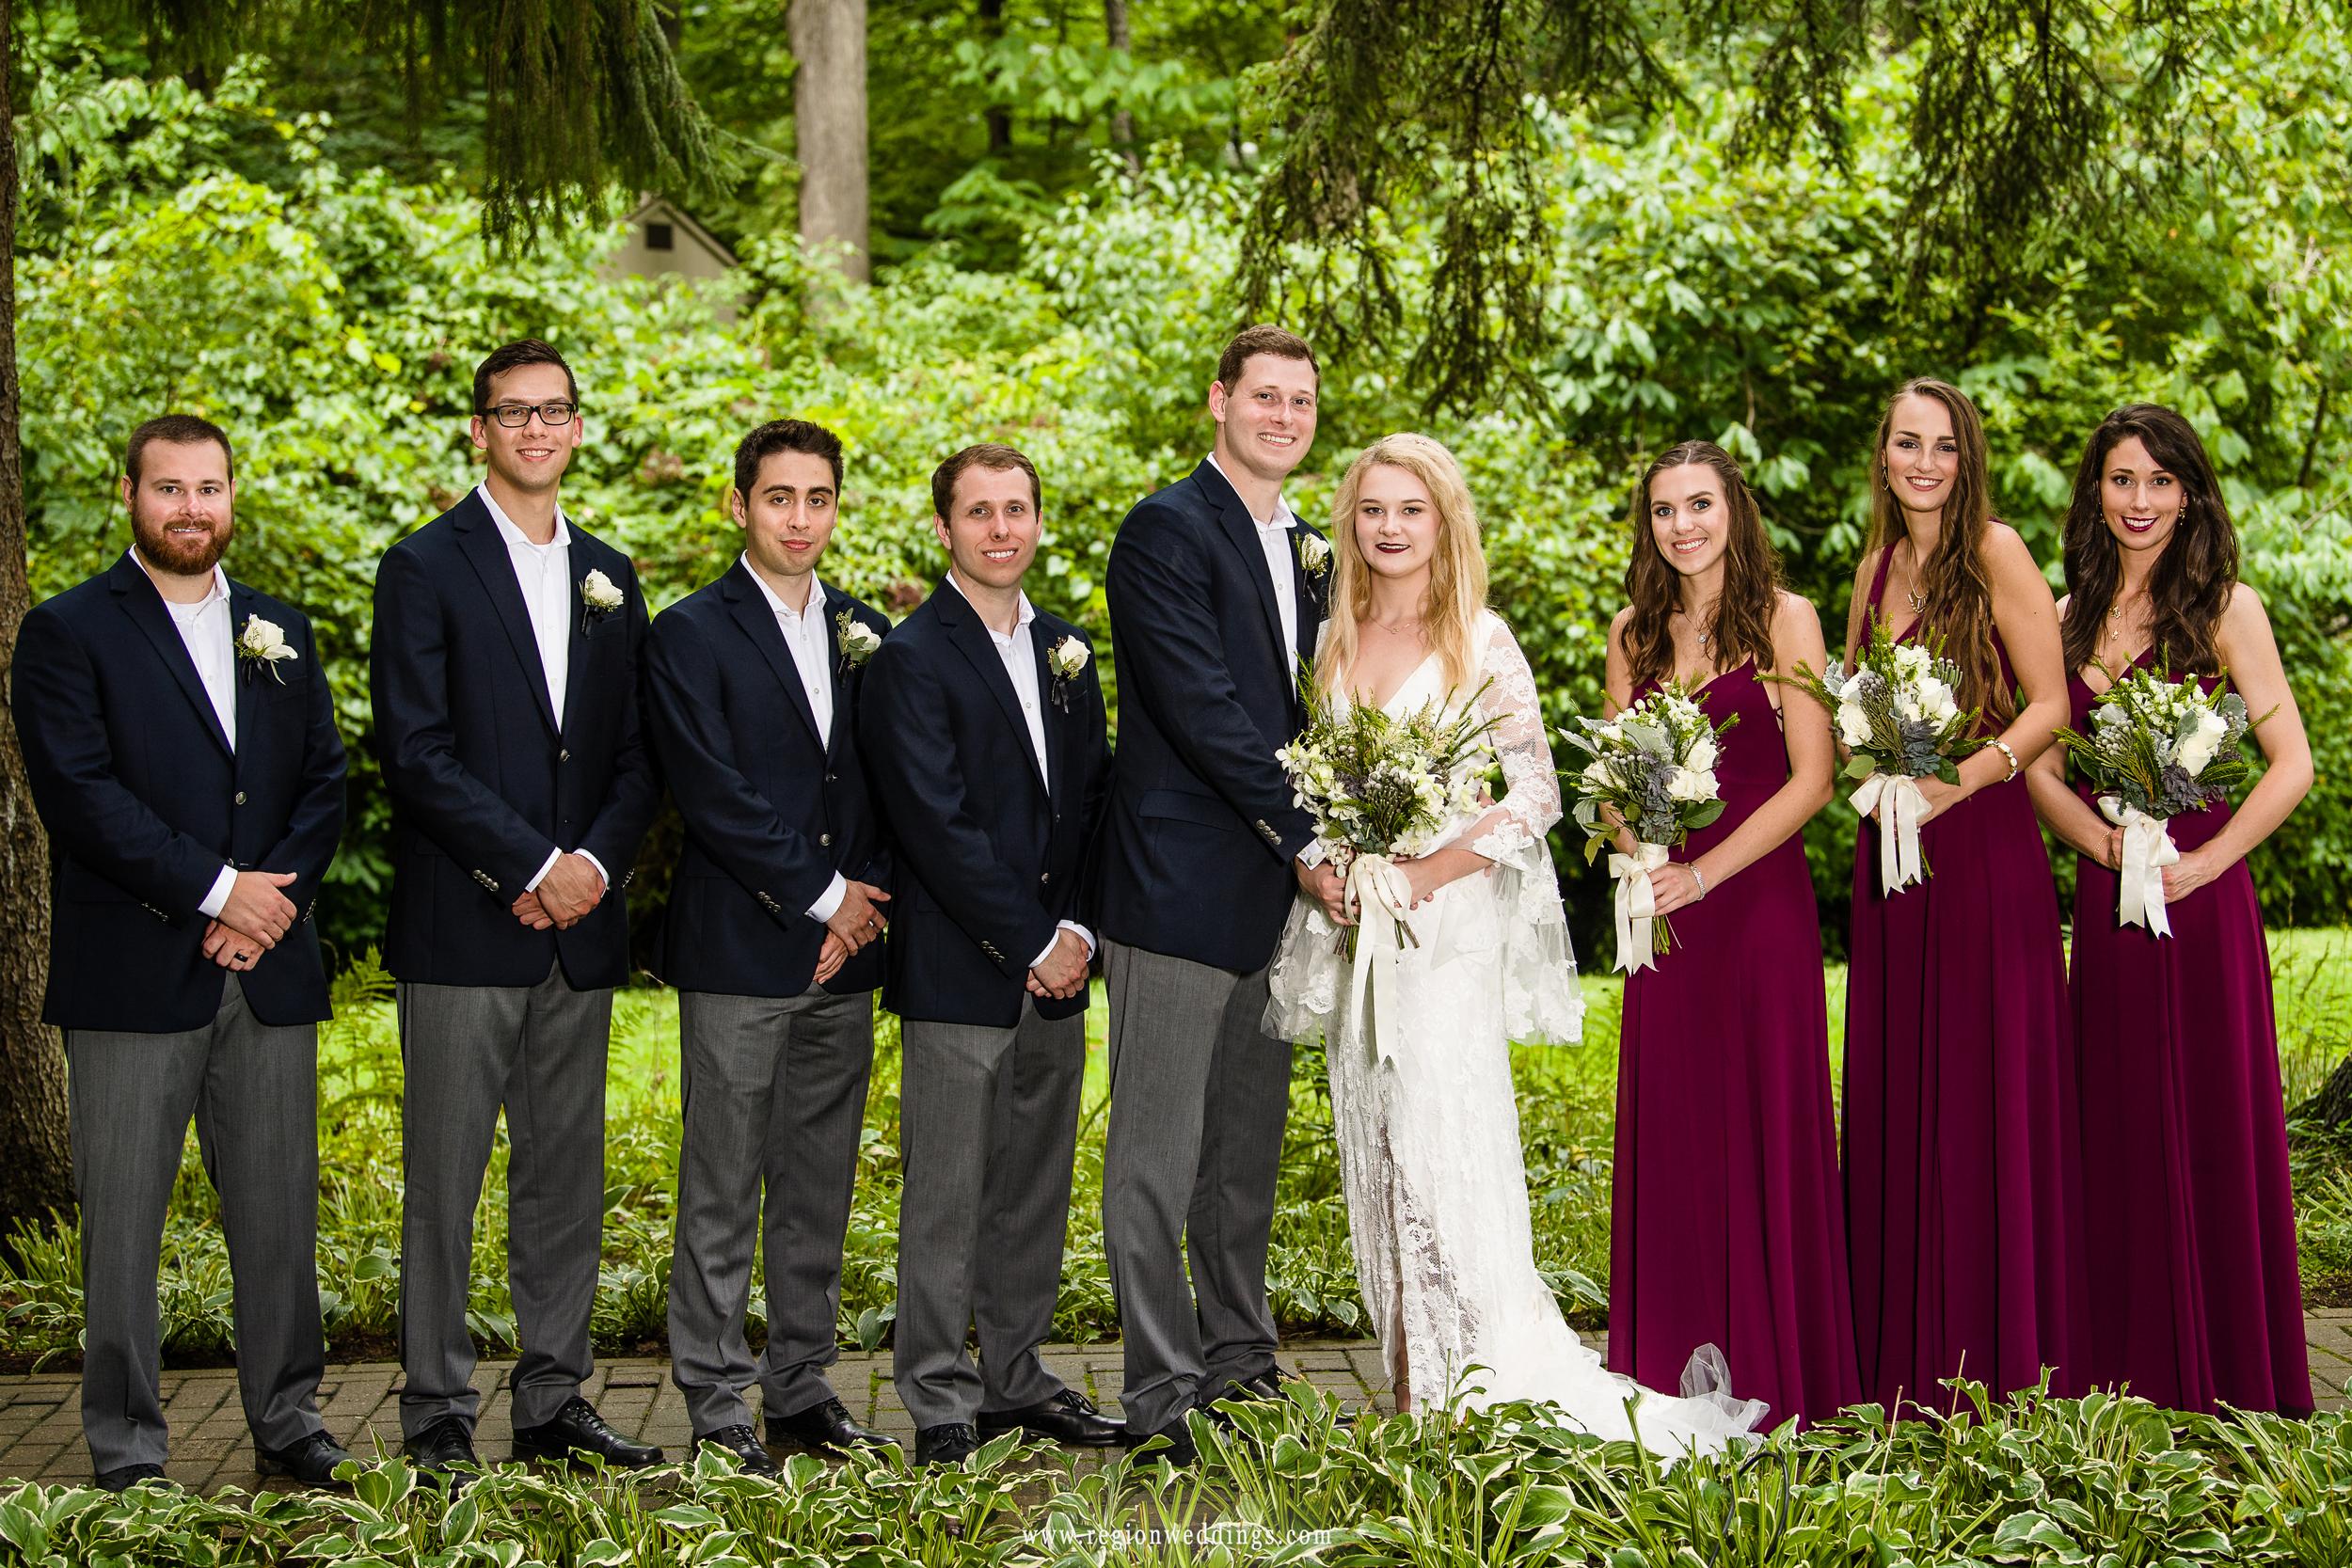 Wedding party group photo at Friendship Botanical Garden.